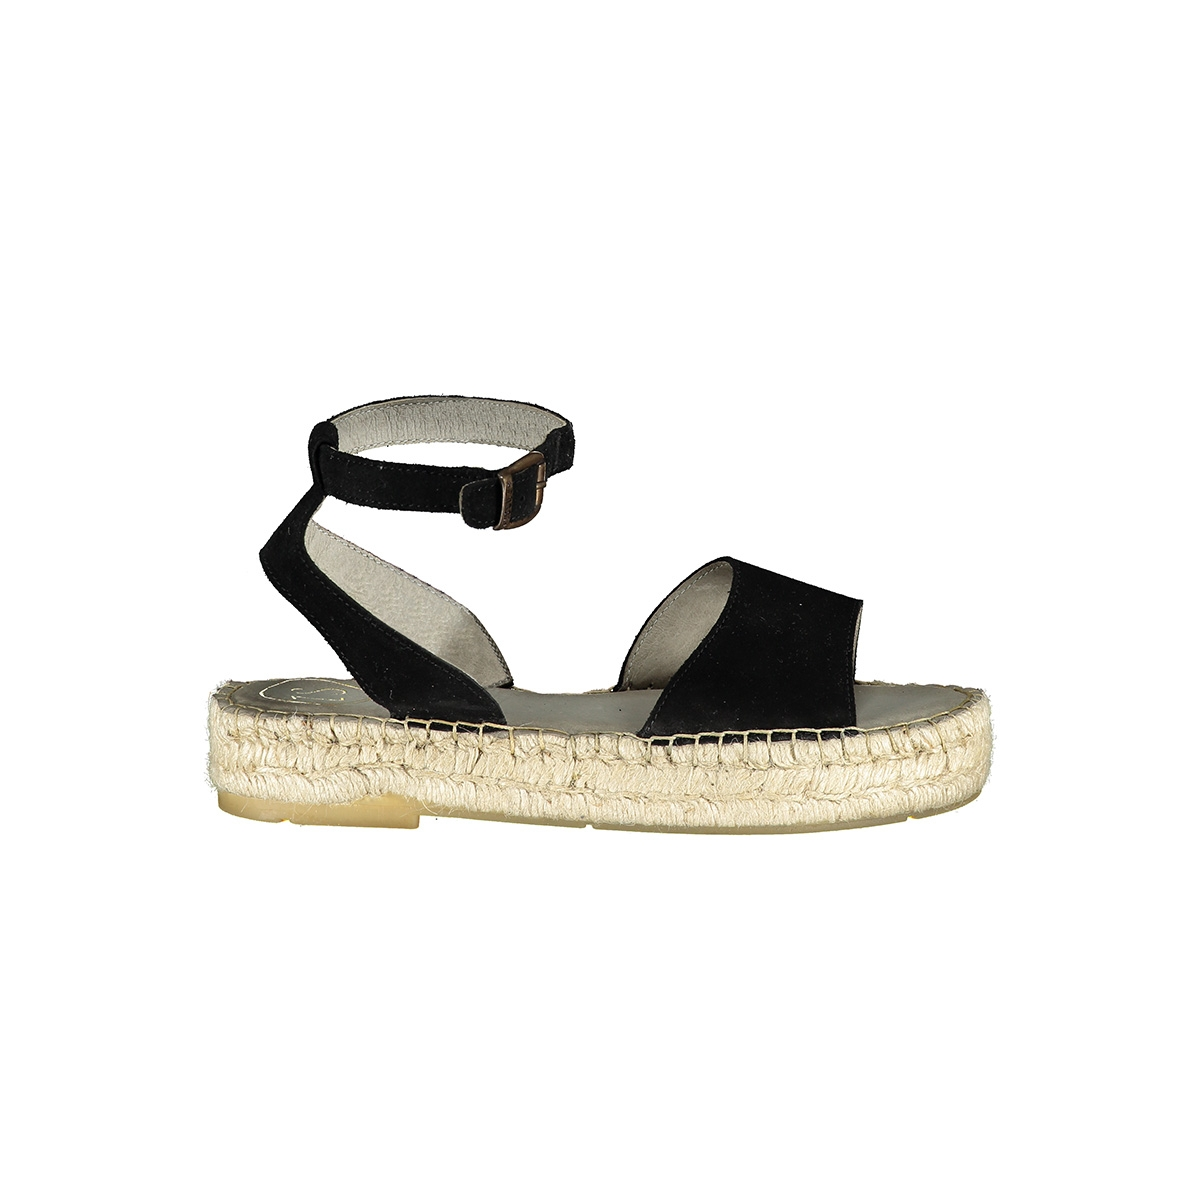 te gekke sandalen z1599 192 21su zusss sandaal black